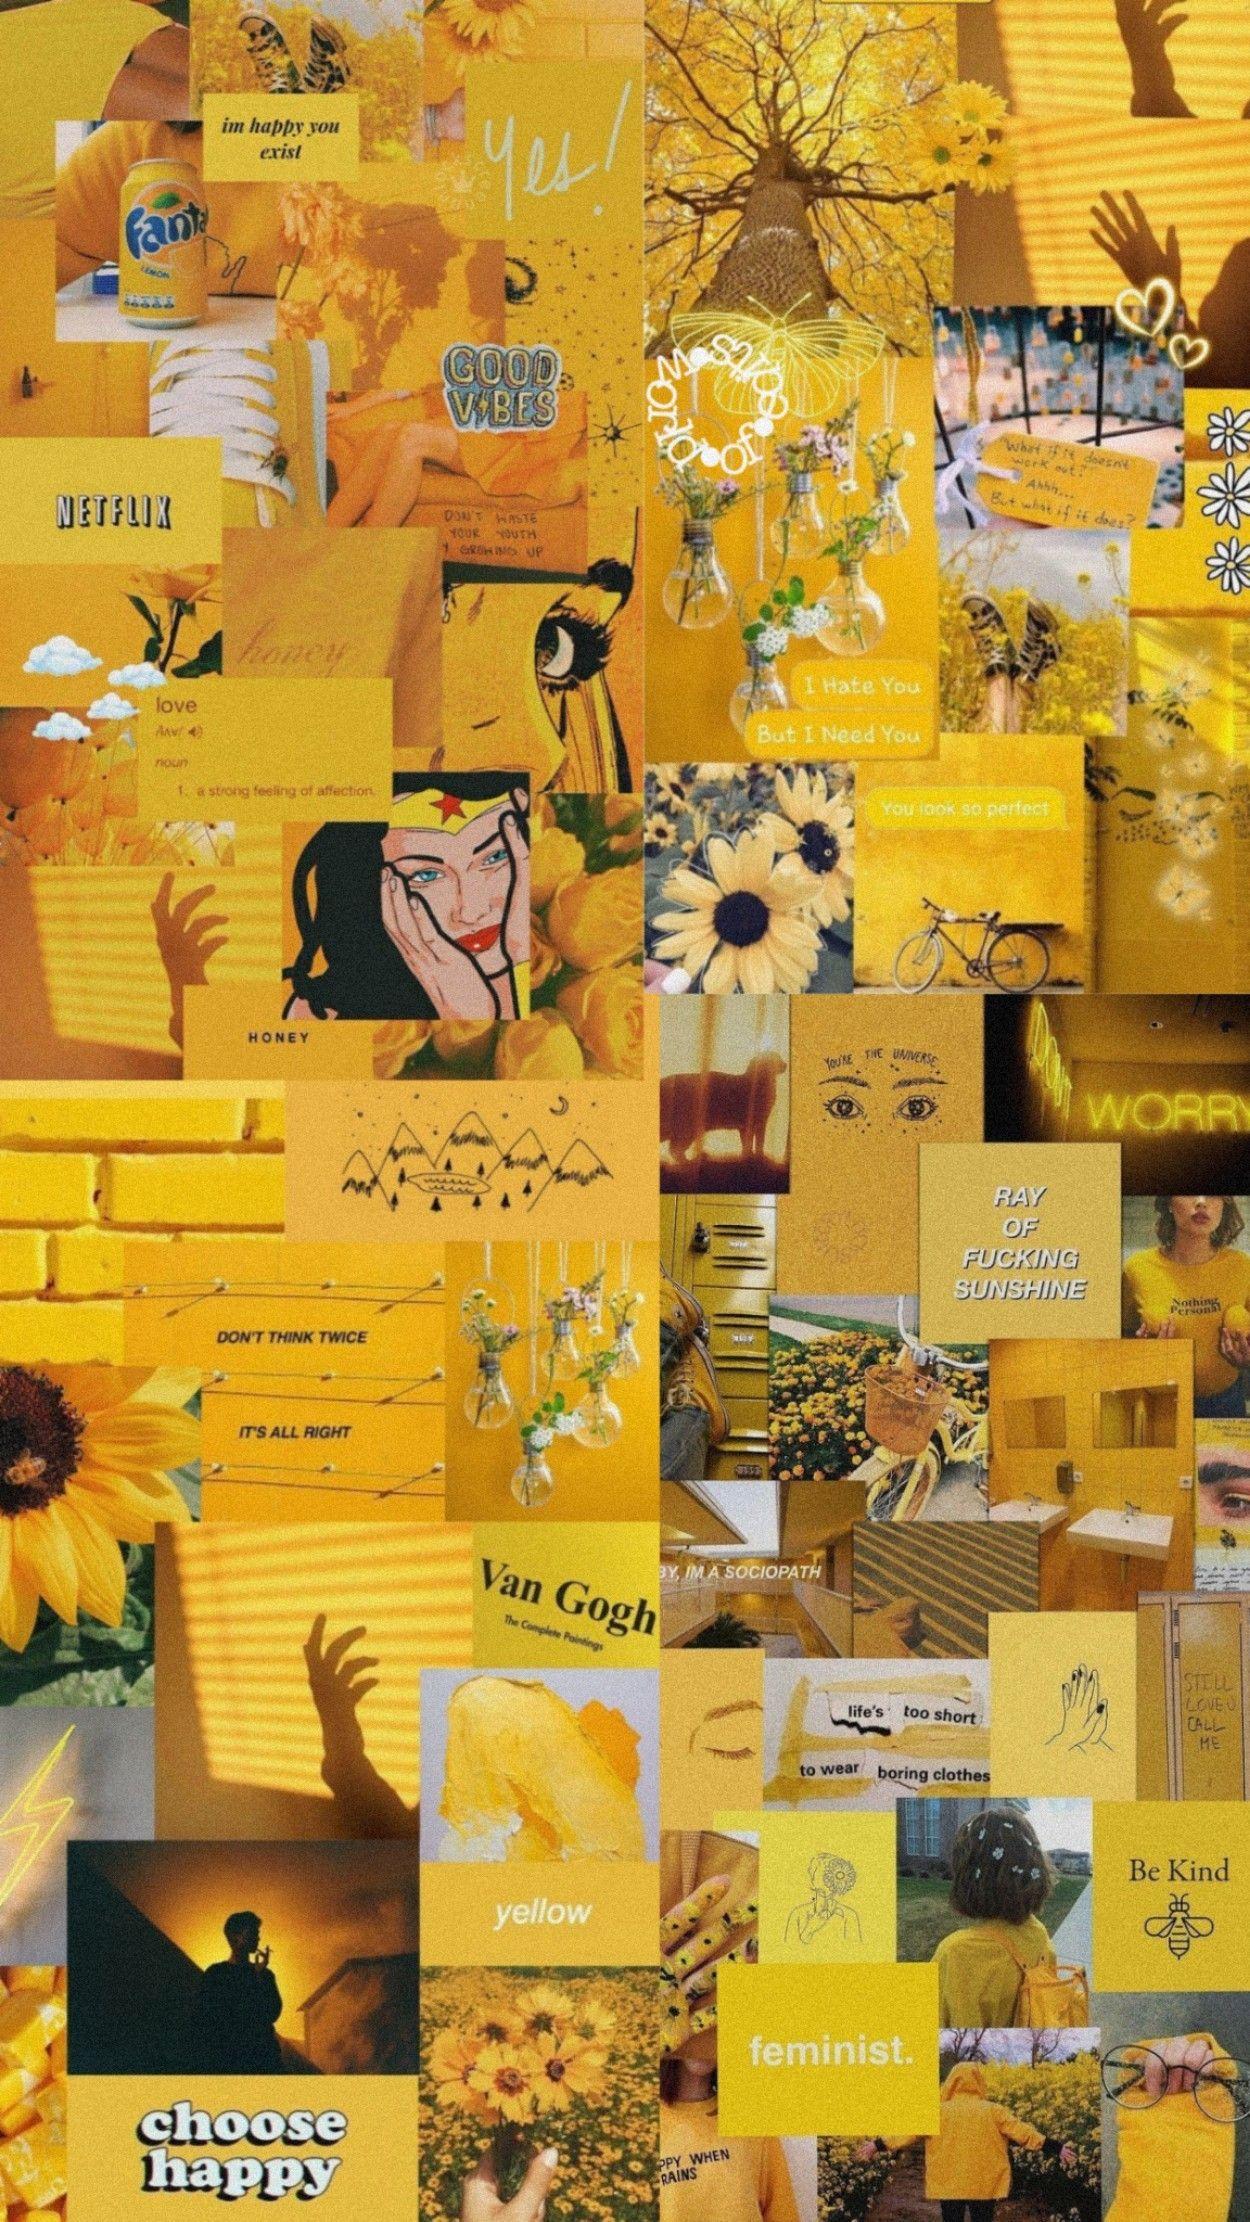 Pin By Lyla Rose On Yellow Iphone Wallpaper Hipster Wallpaper Tumblr Lockscreen Edgy Wallpaper